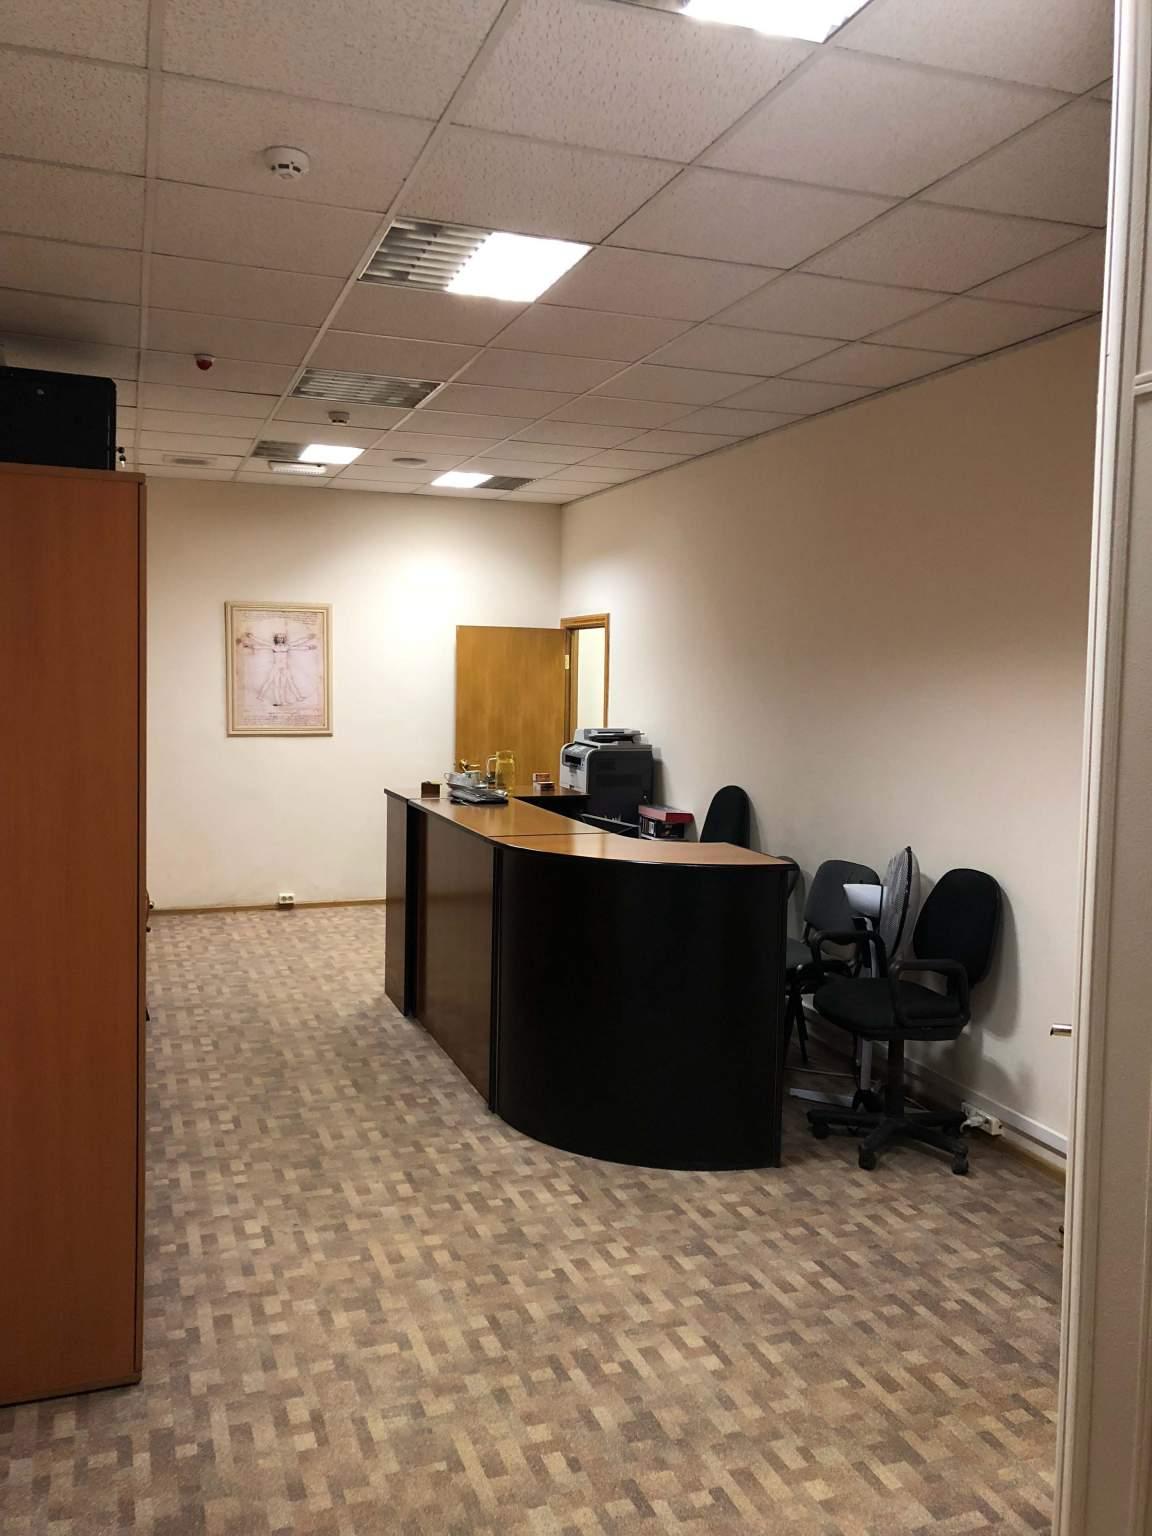 Аренда офиса москве без посредников Аренда офиса 50 кв Самотечный 1-й переулок